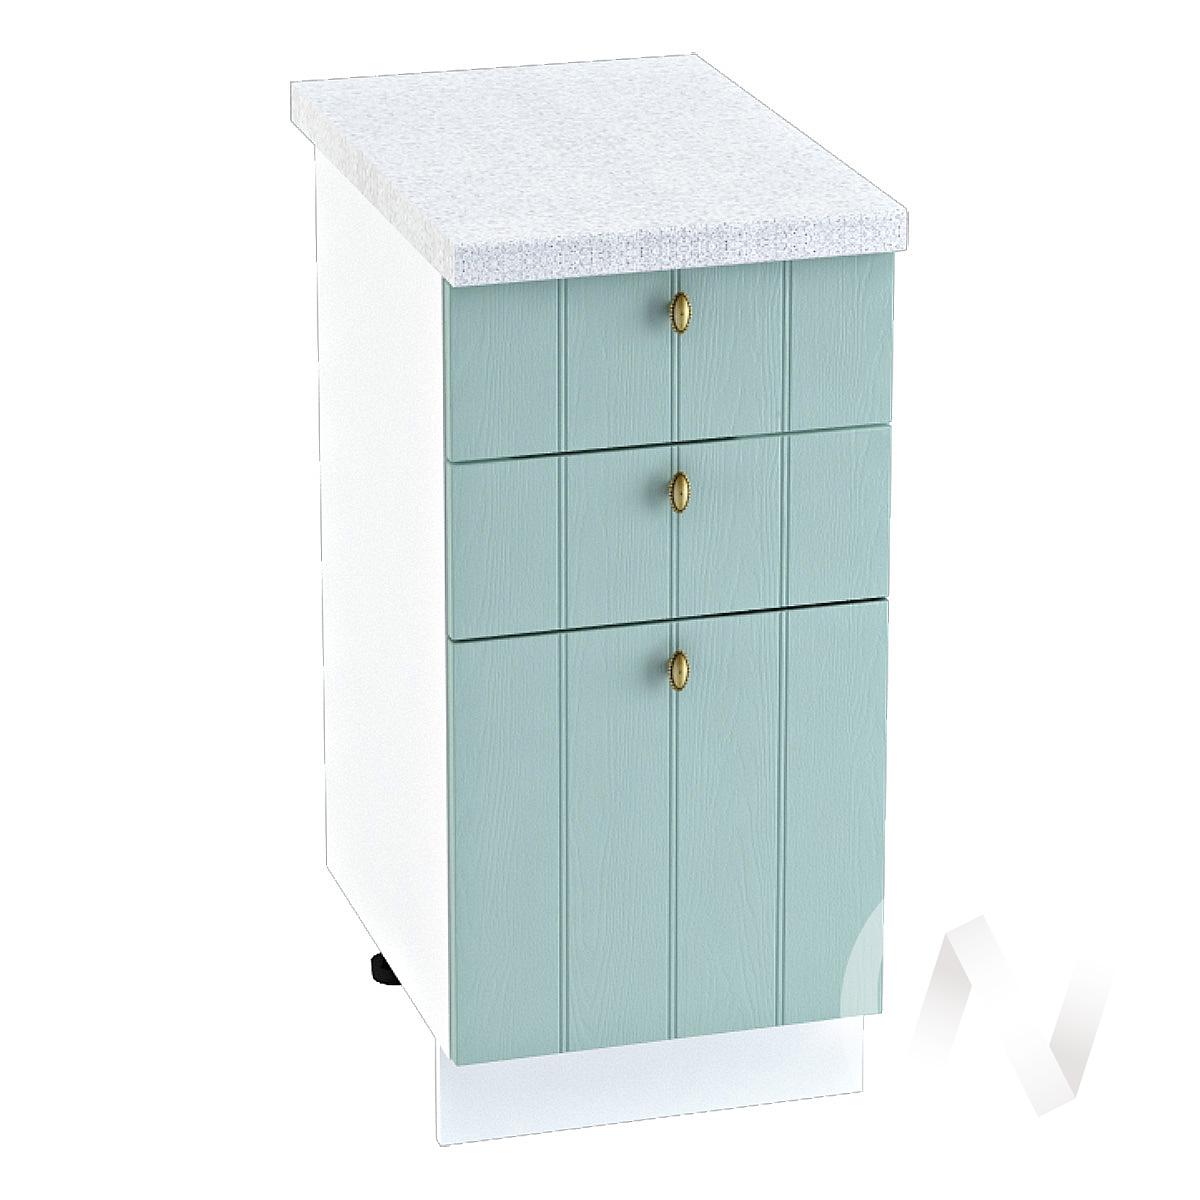 "Кухня ""Прованс"": Шкаф нижний с 3-мя ящиками 400, ШН3Я 400 (голубой/корпус белый)"